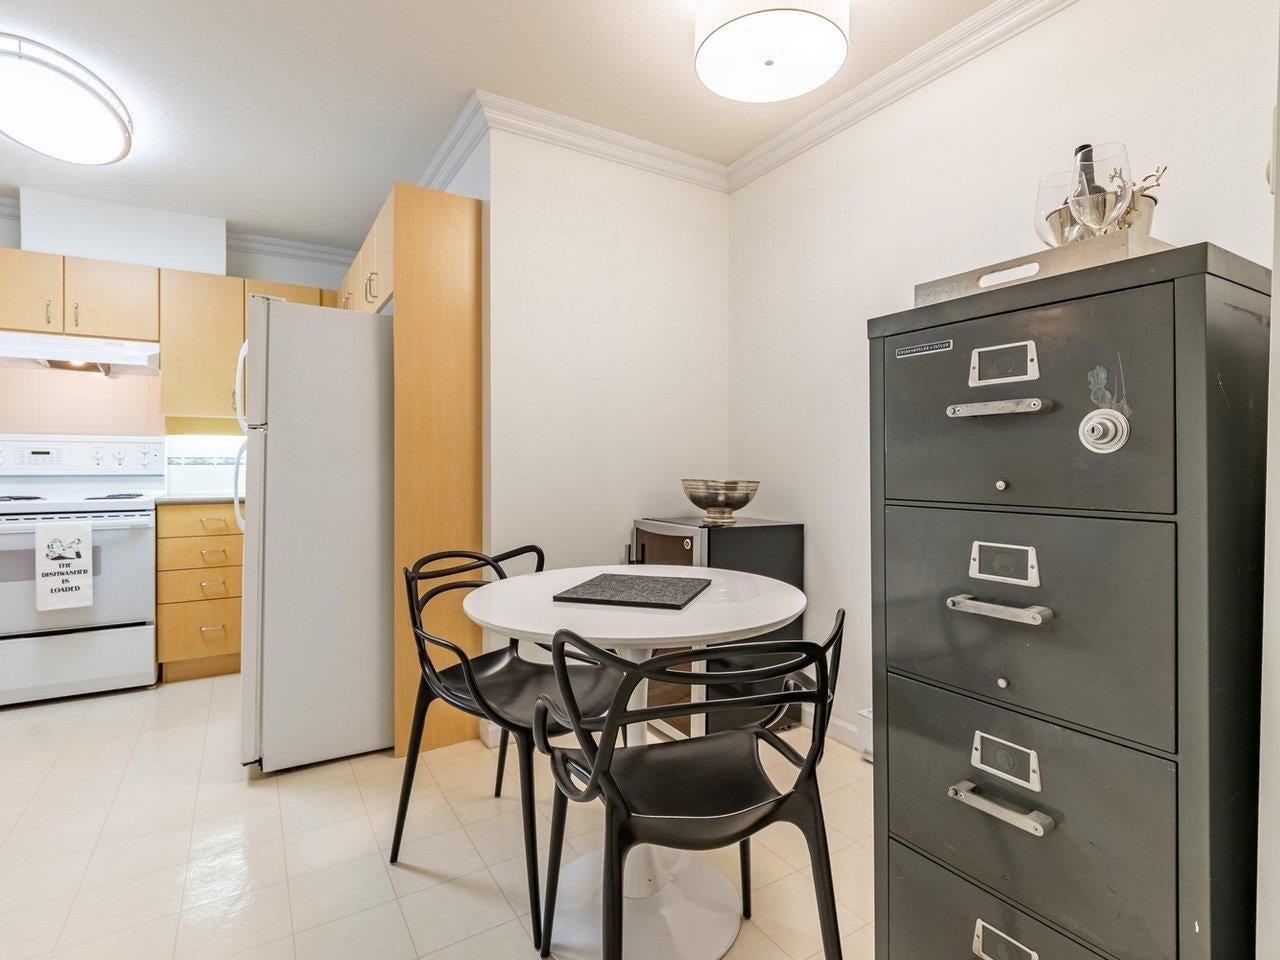 306 15298 20 AVENUE - King George Corridor Apartment/Condo for sale, 2 Bedrooms (R2625551) - #9